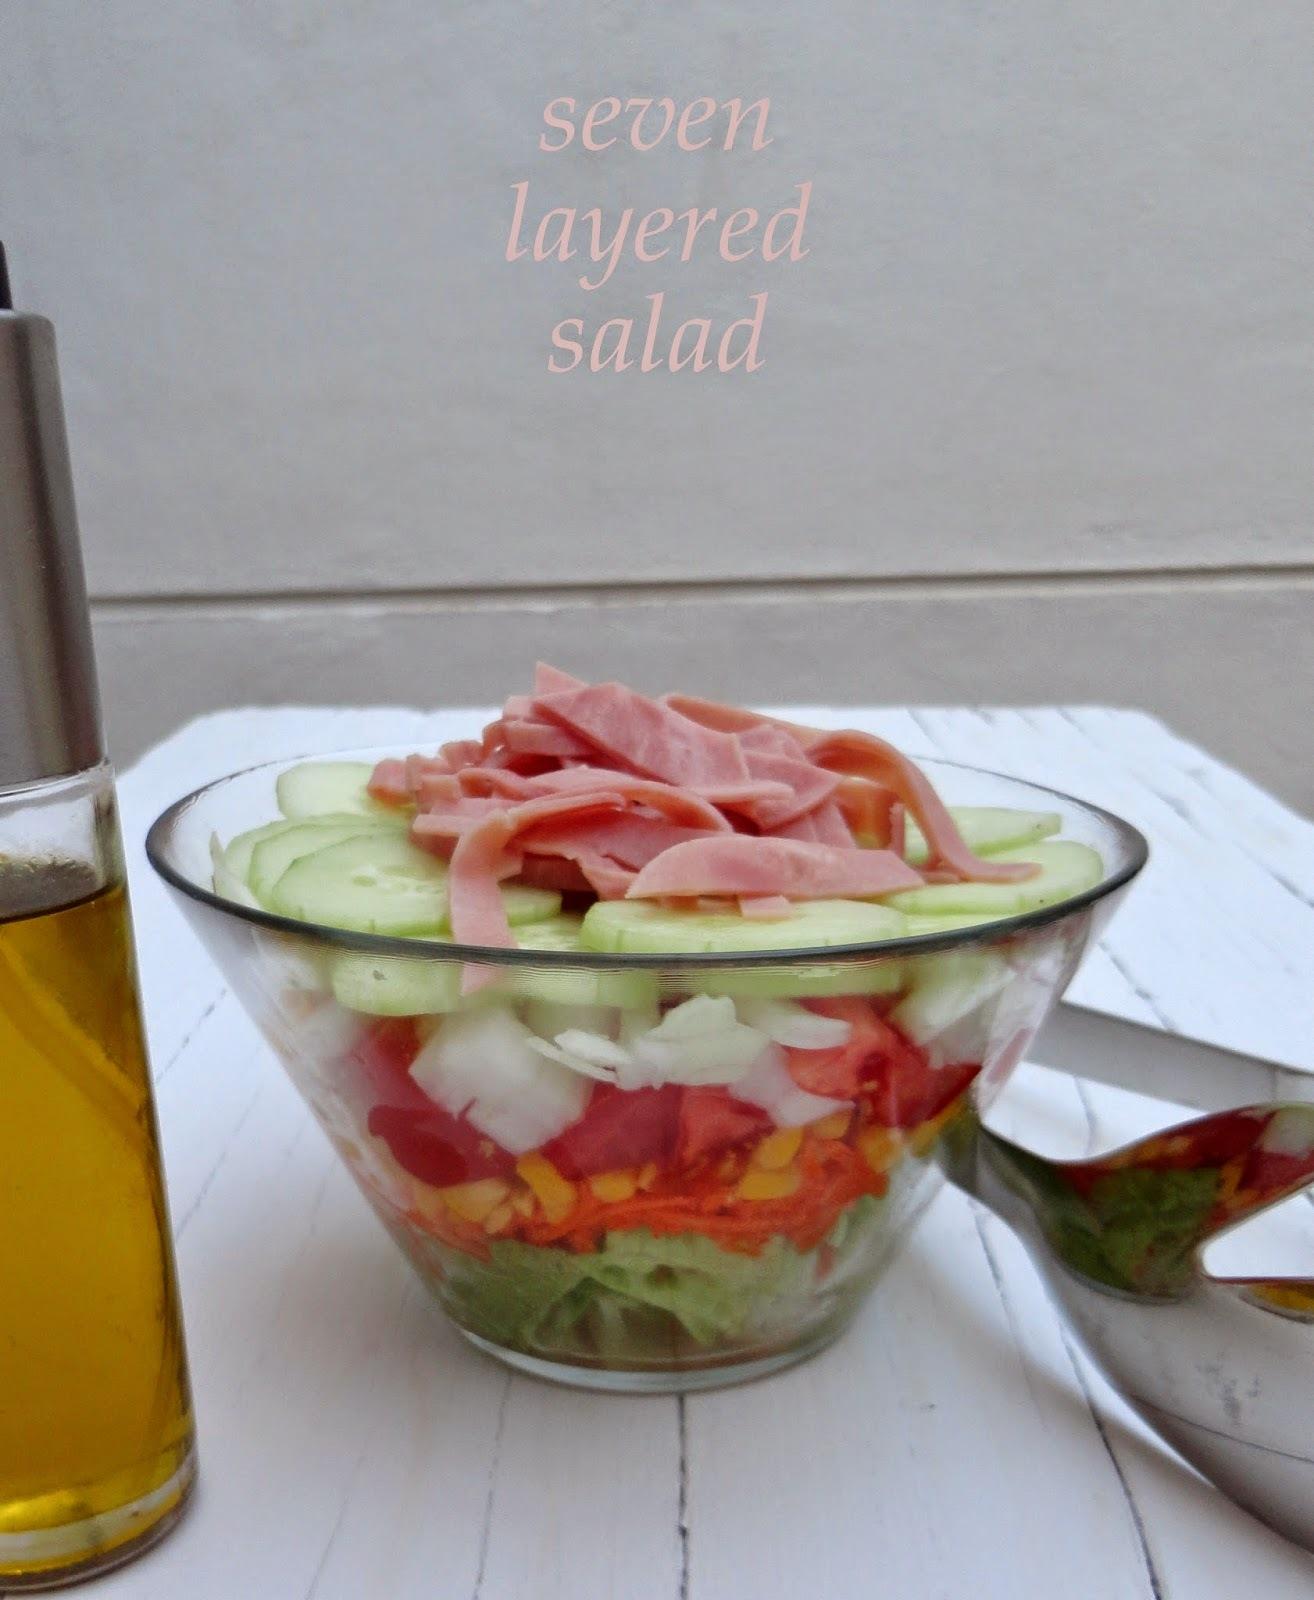 Seven Layered Salad (Ensalada 7 capas)